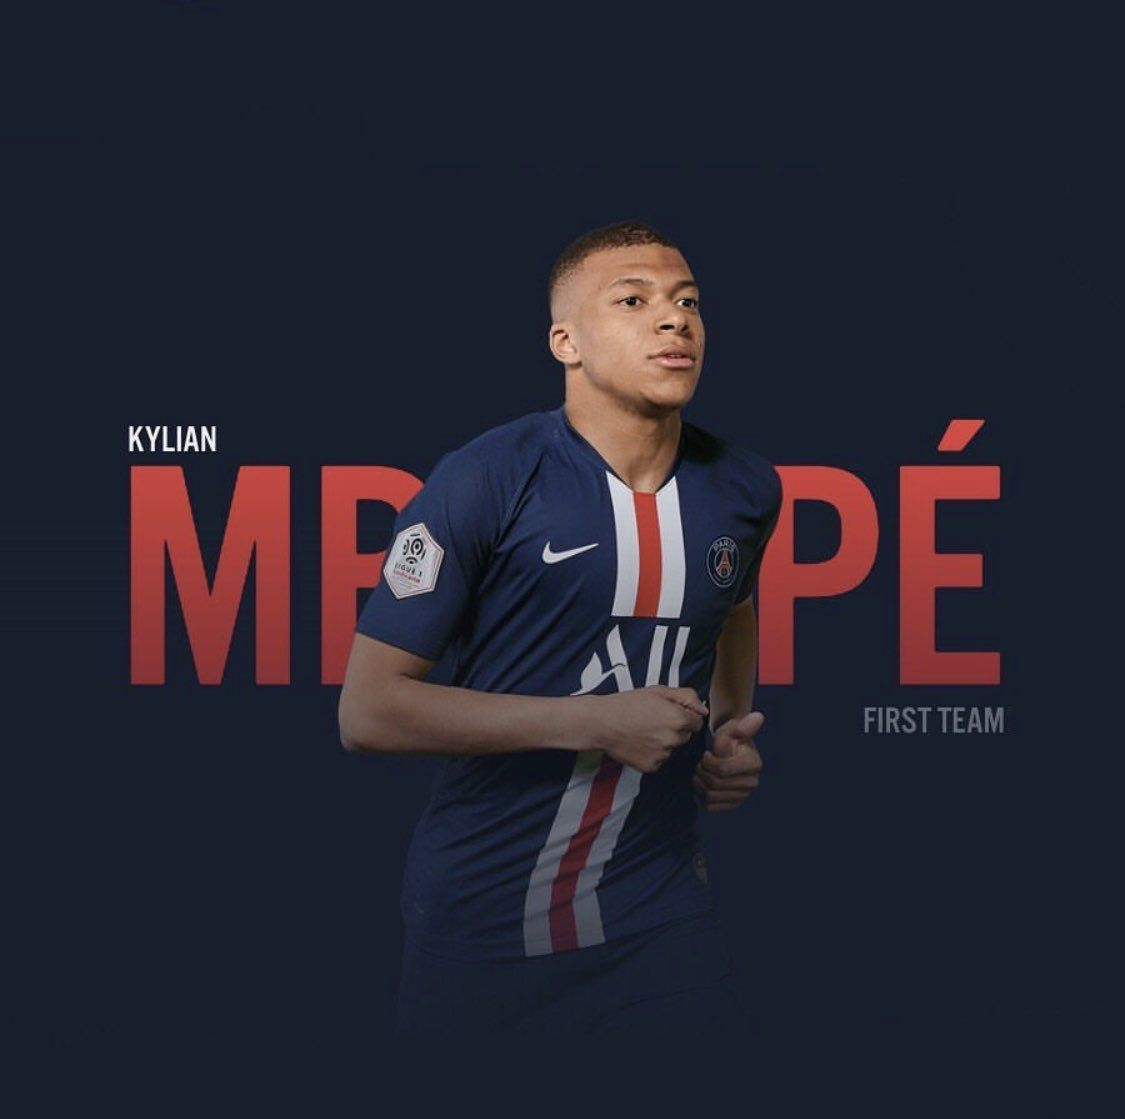 Kylian Mbappe On Twitter Psg One Team Football